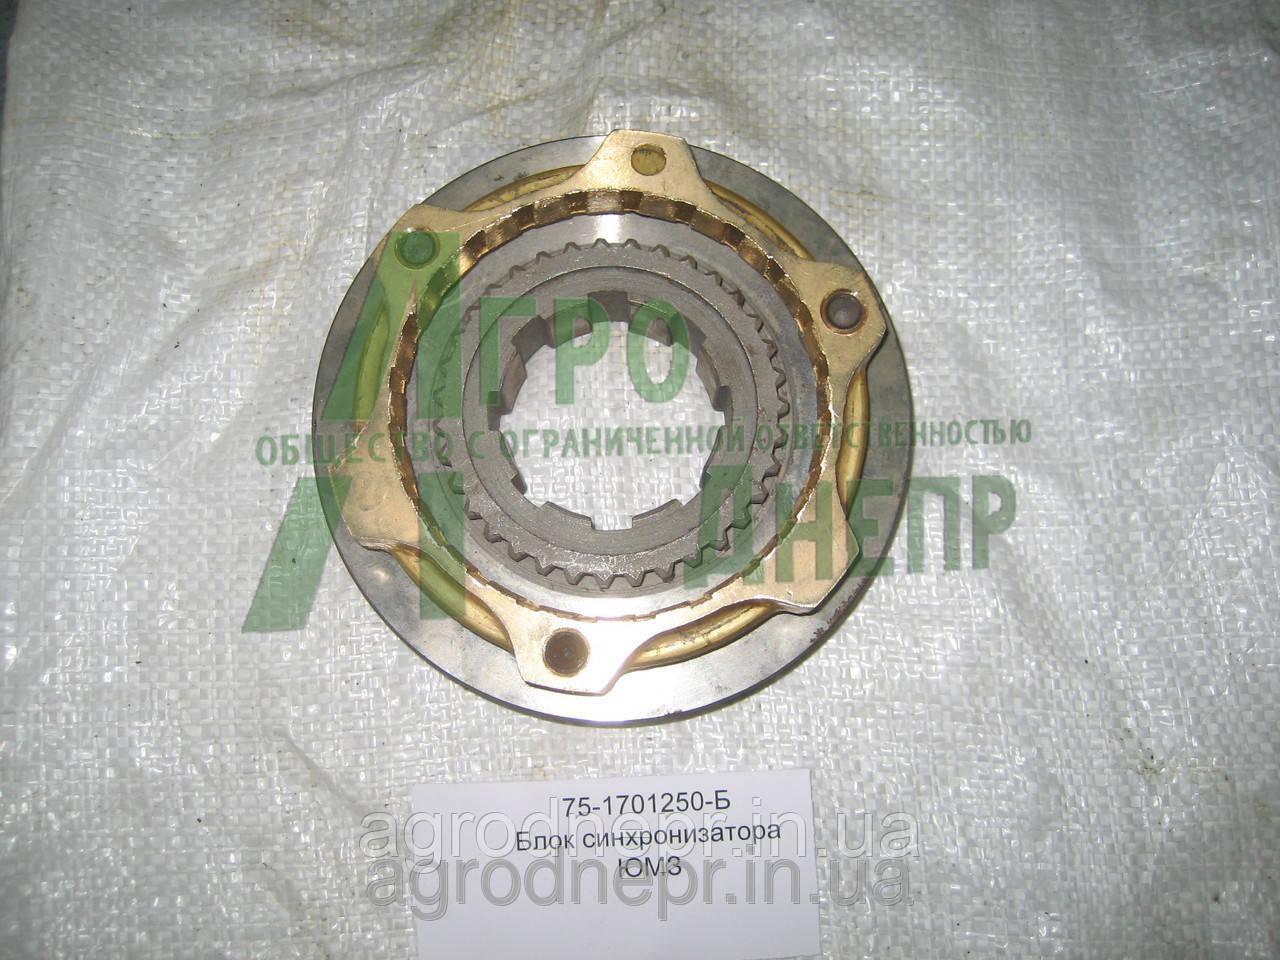 Блок синхронизатора (синхронизатор) КПП ЮМЗ 8280 75-1701250-Б